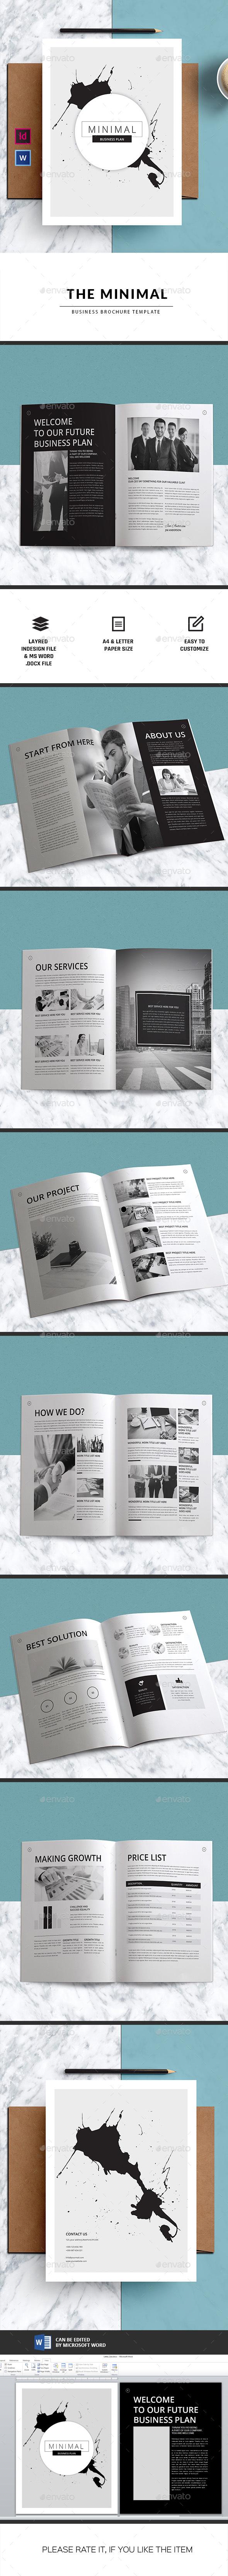 MINIMAL | Business Brochure-Indesign Template - Corporate Brochures